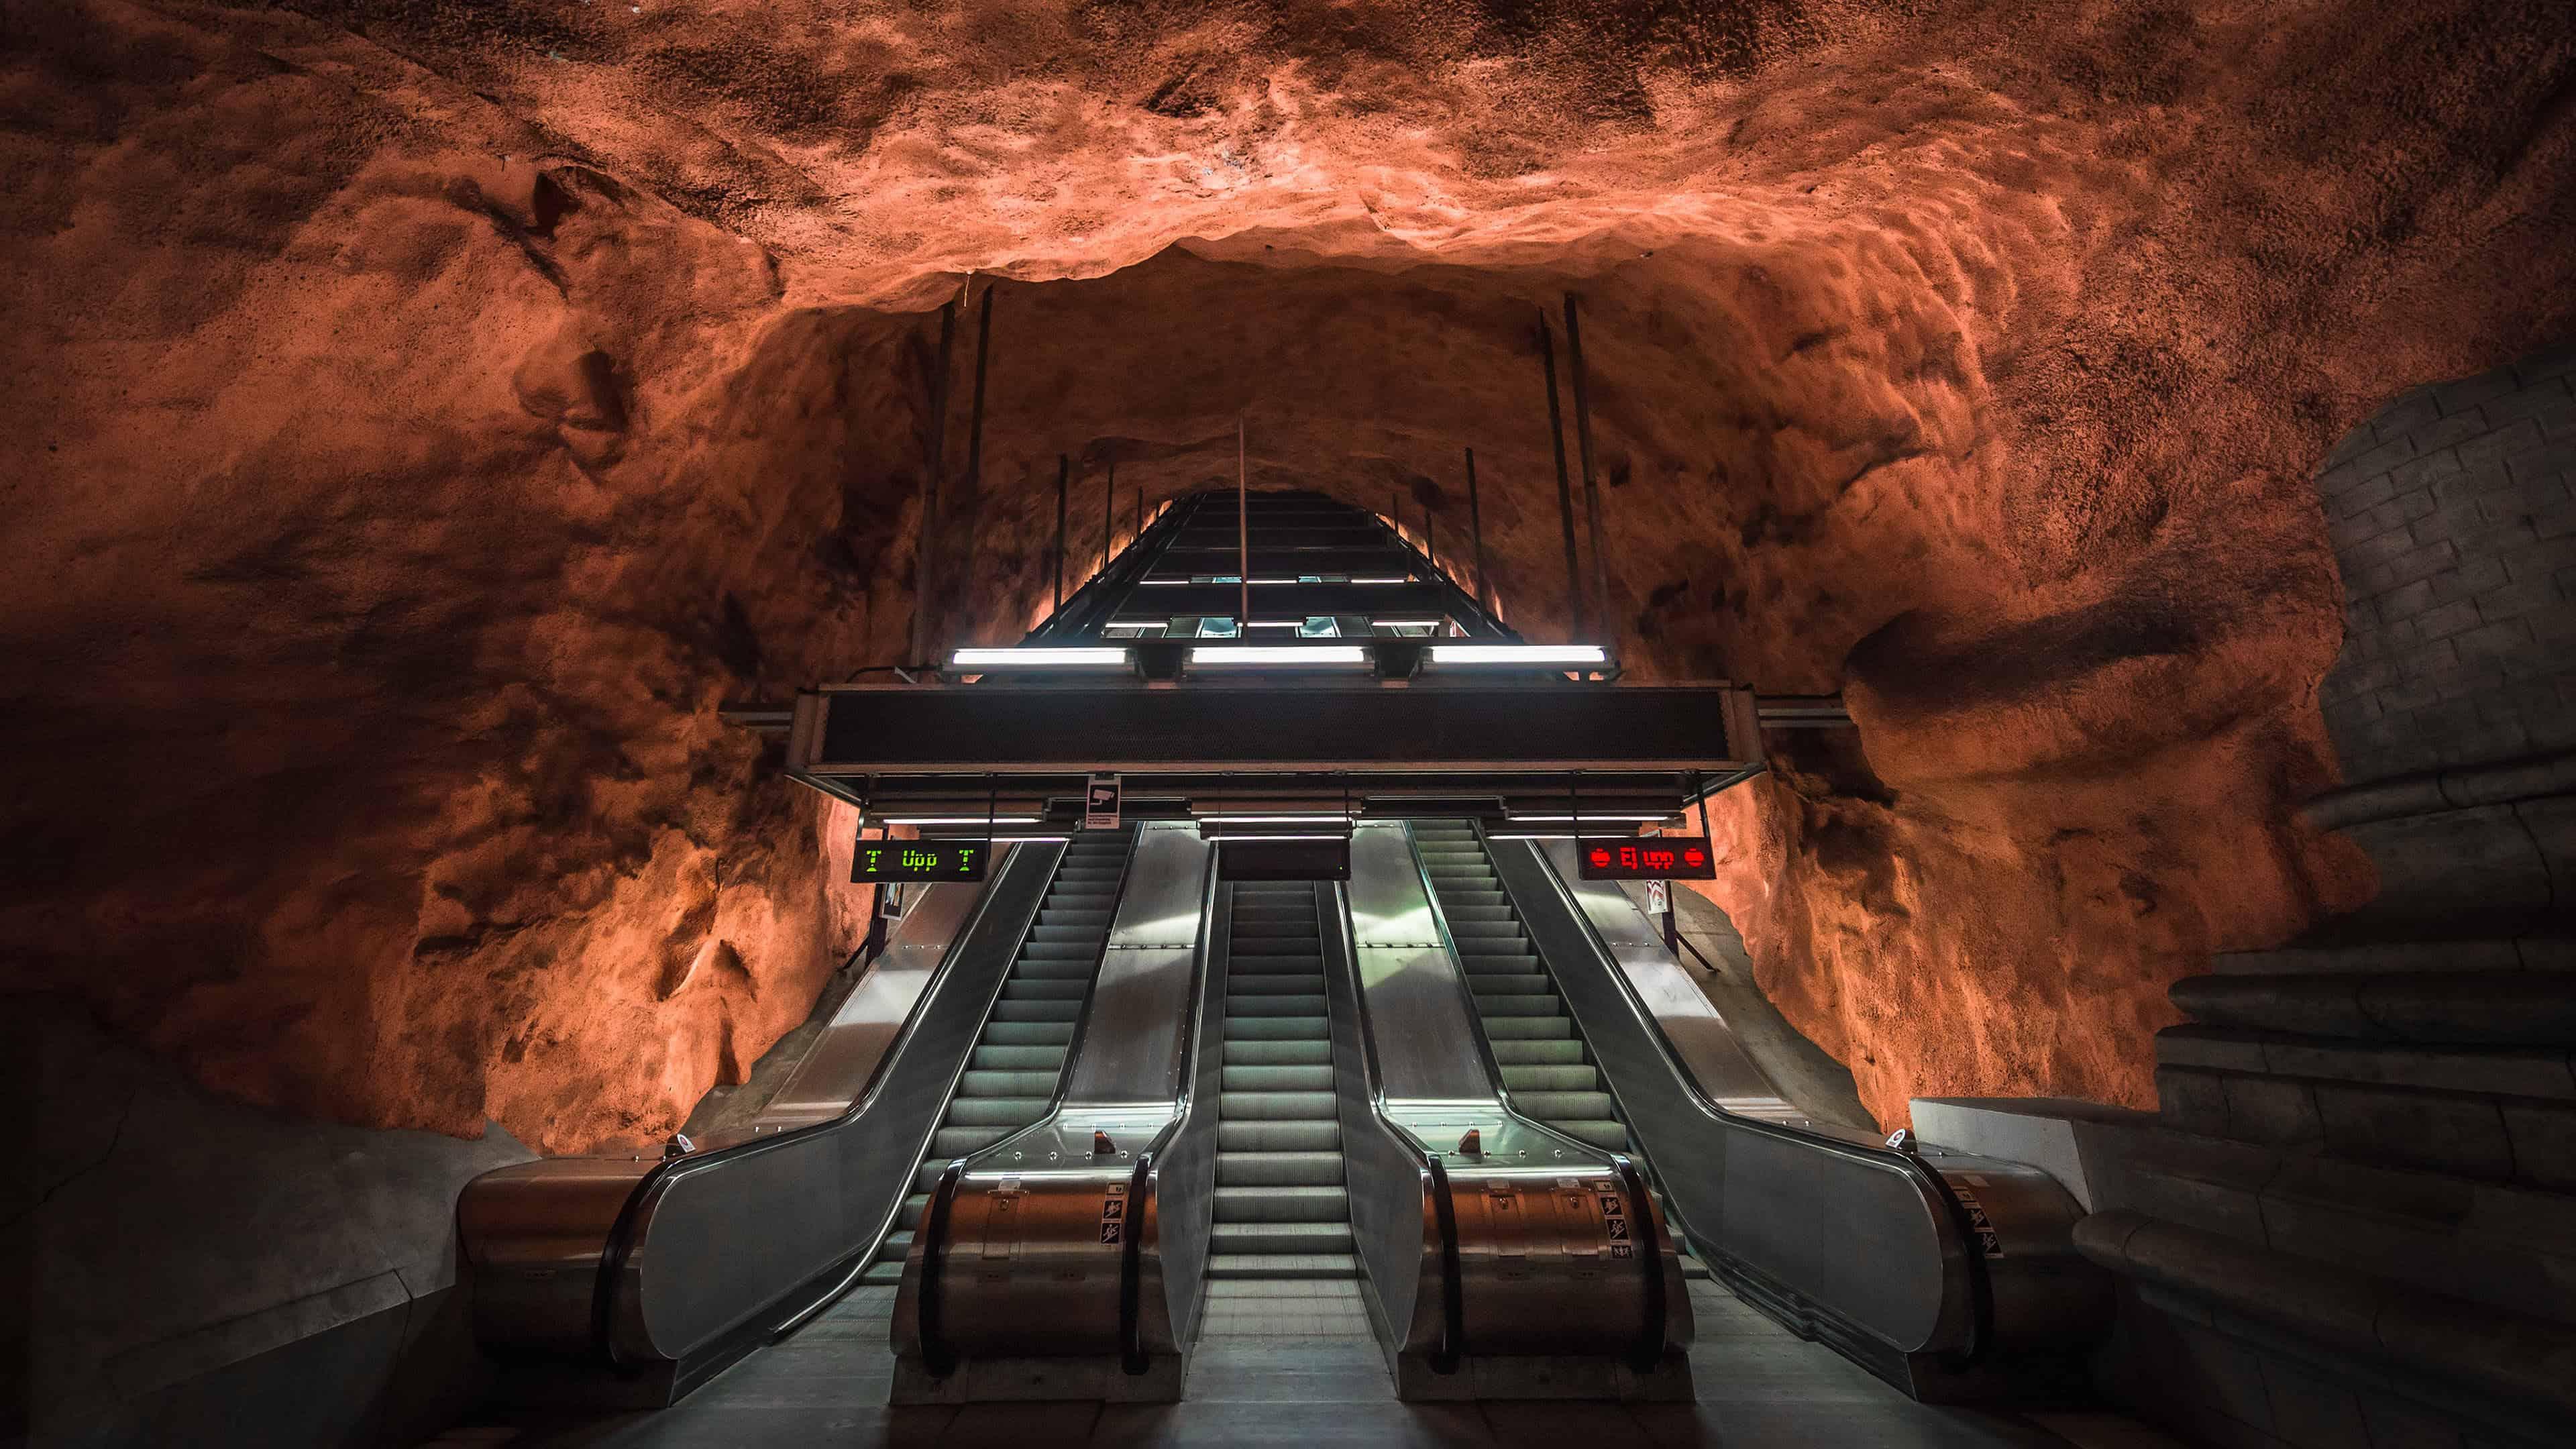 radhuset metro station stockholm sweden uhd 4k wallpaper